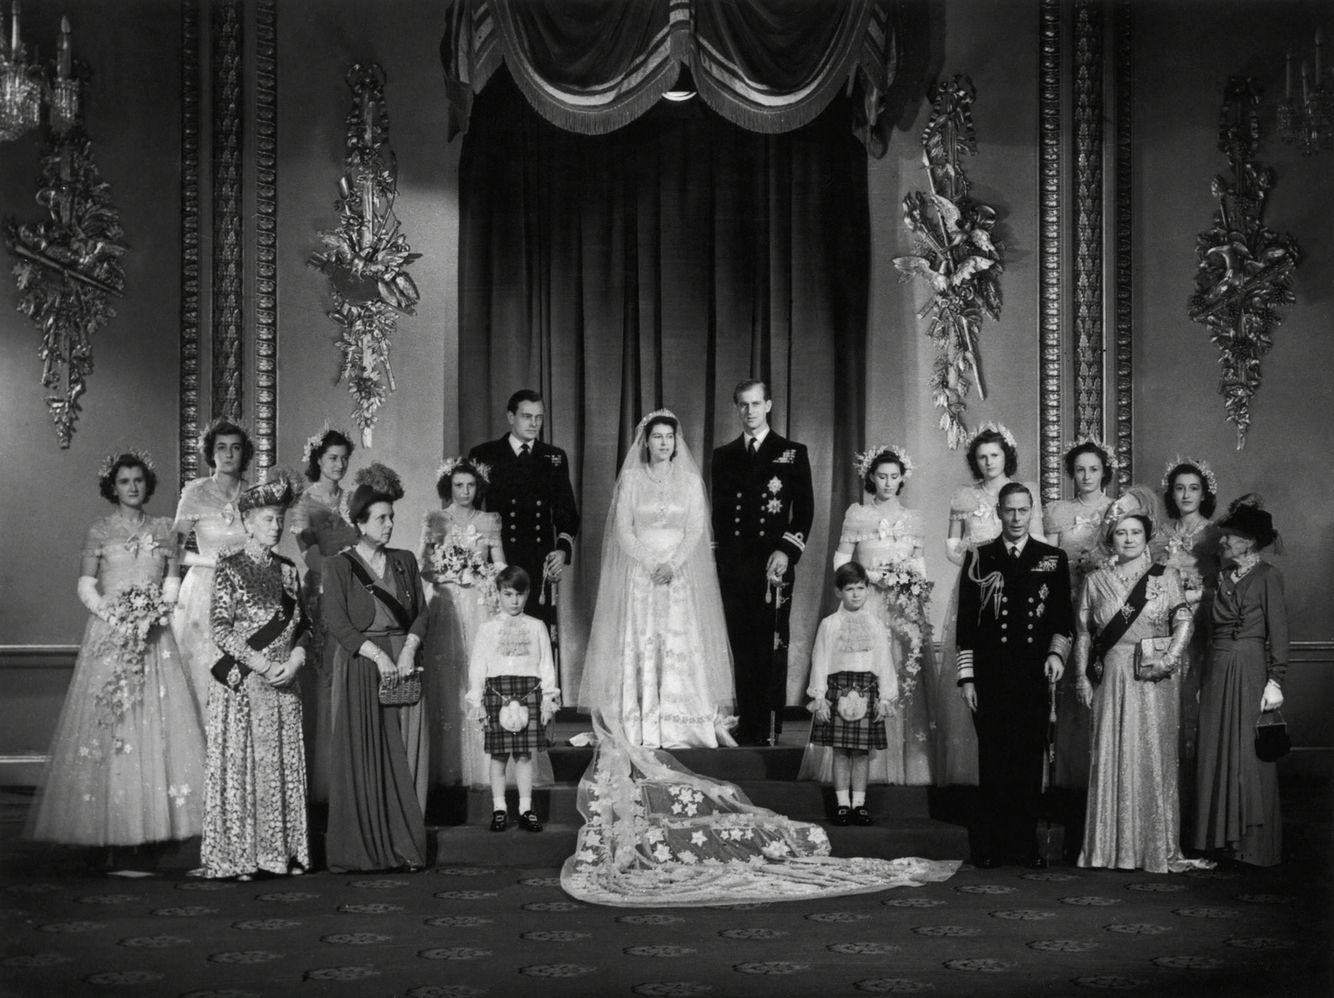 Wedding Group Boda De La Reina Isabel Reina Isabel Princesa Elizabeth